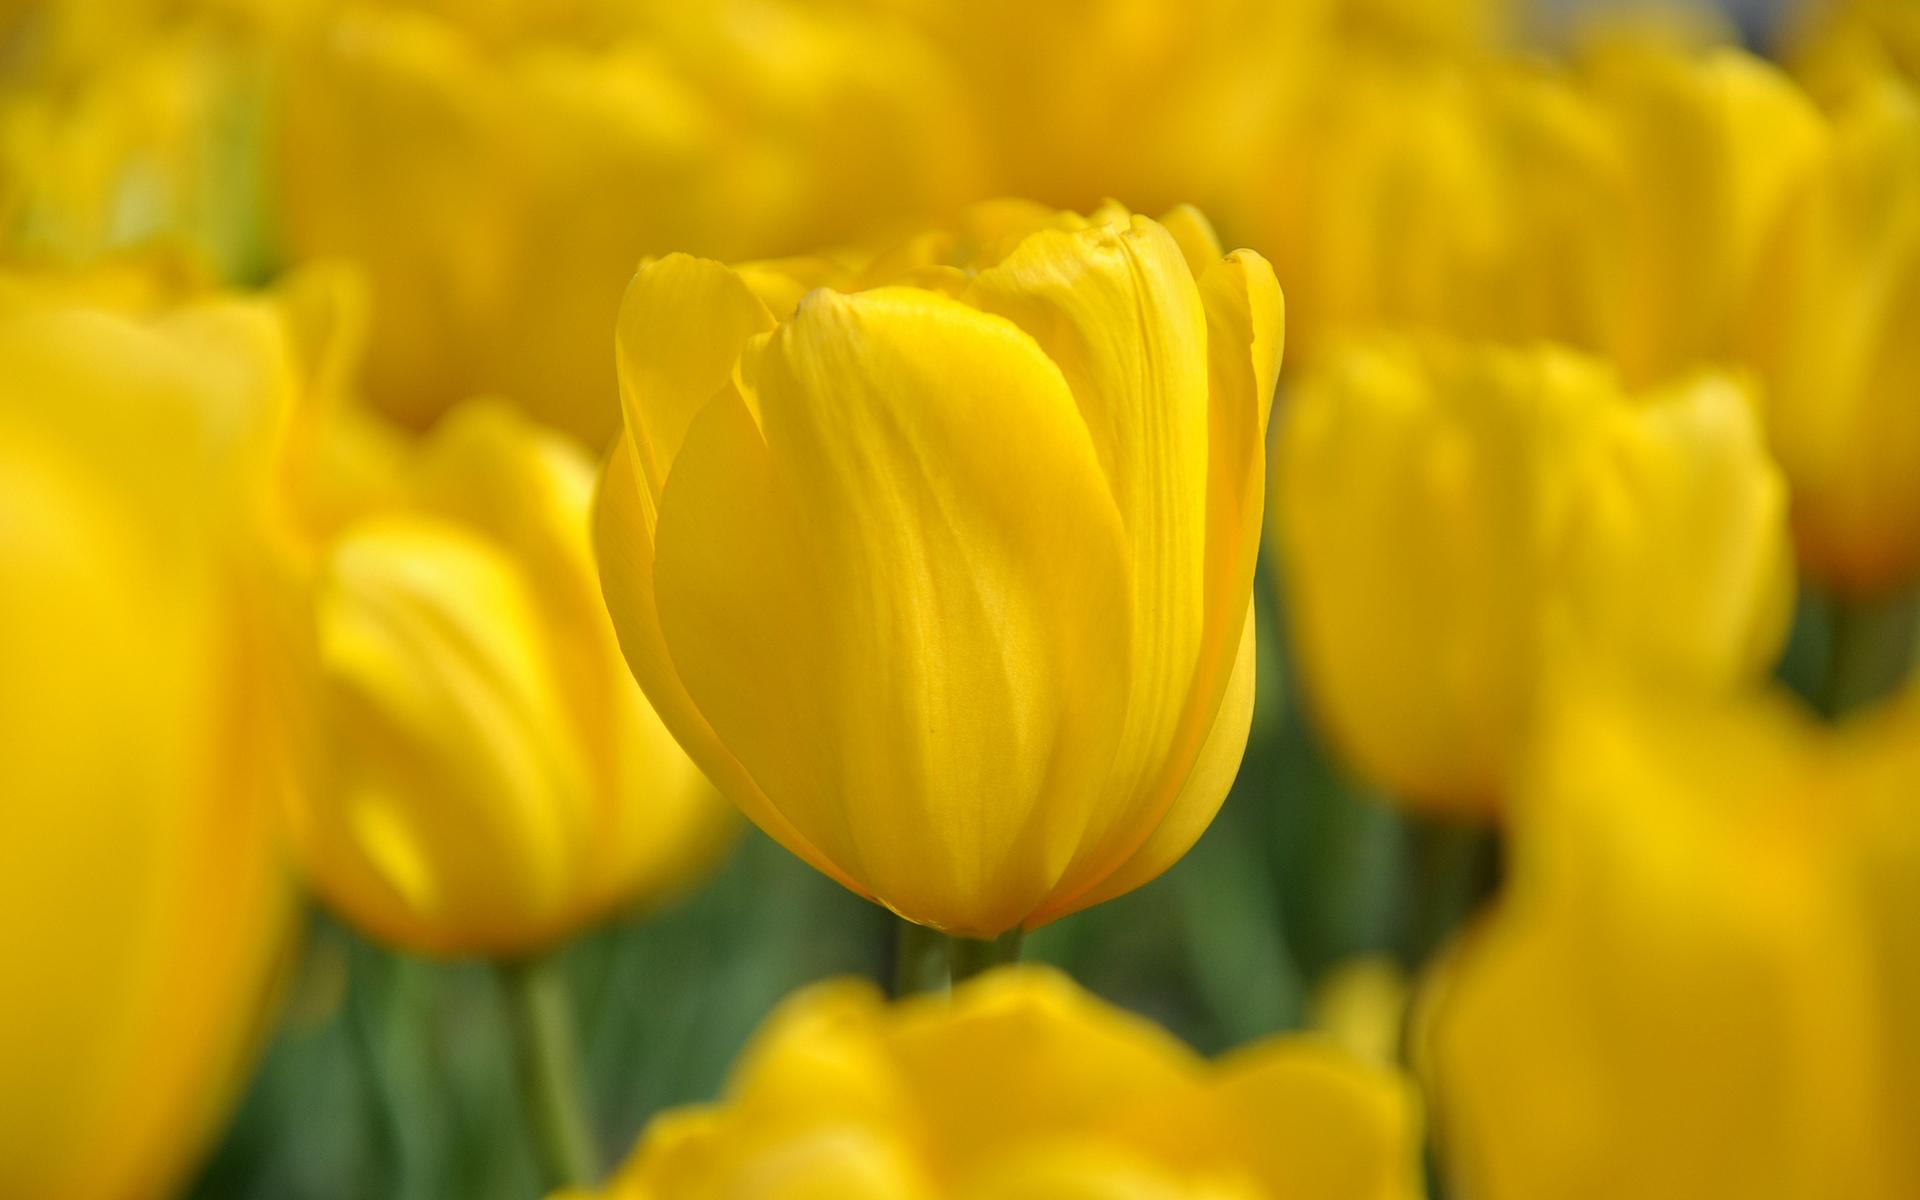 Balloons 3d Live Wallpaper Pictures Of Tulips Flowers Hd Desktop Wallpapers 4k Hd